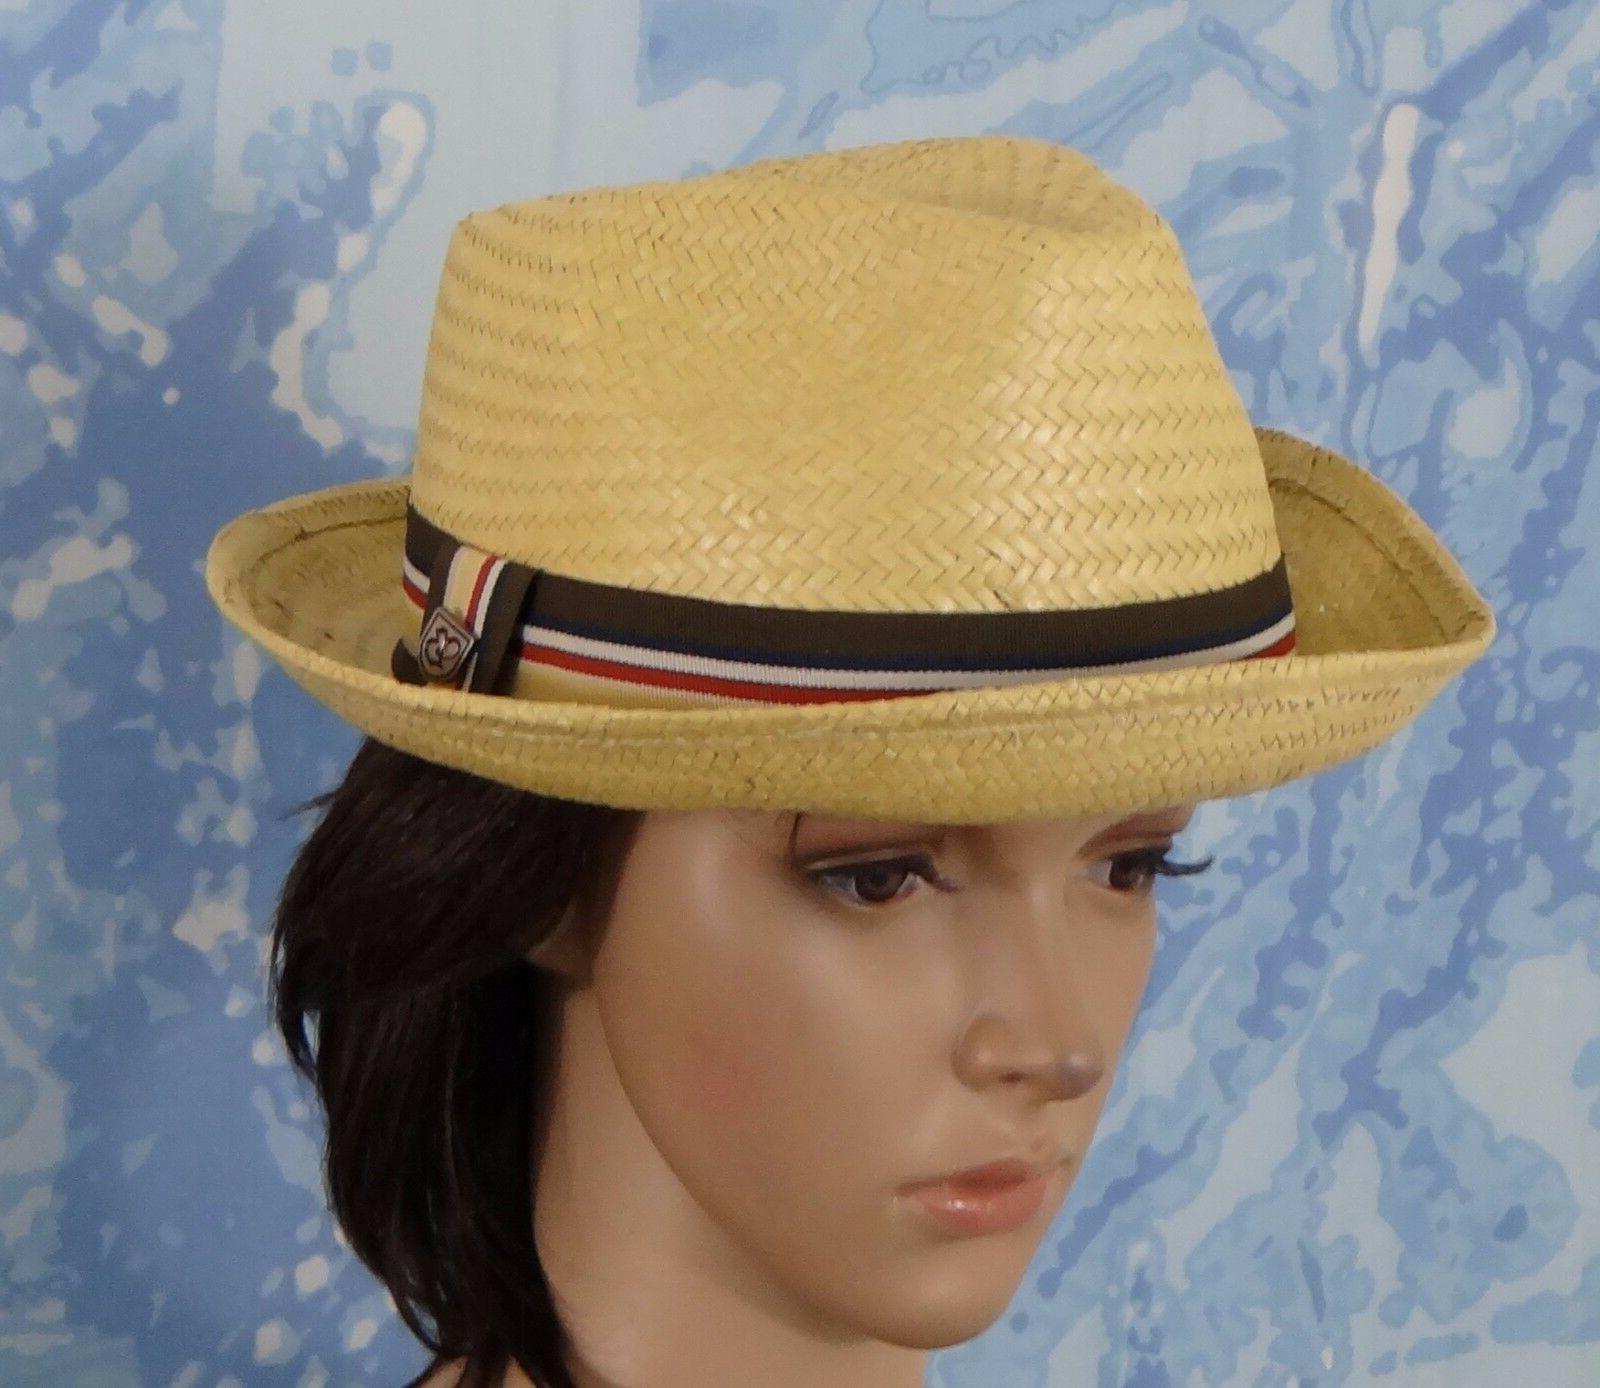 NWT Brixton straw Fedora Hat, size XL